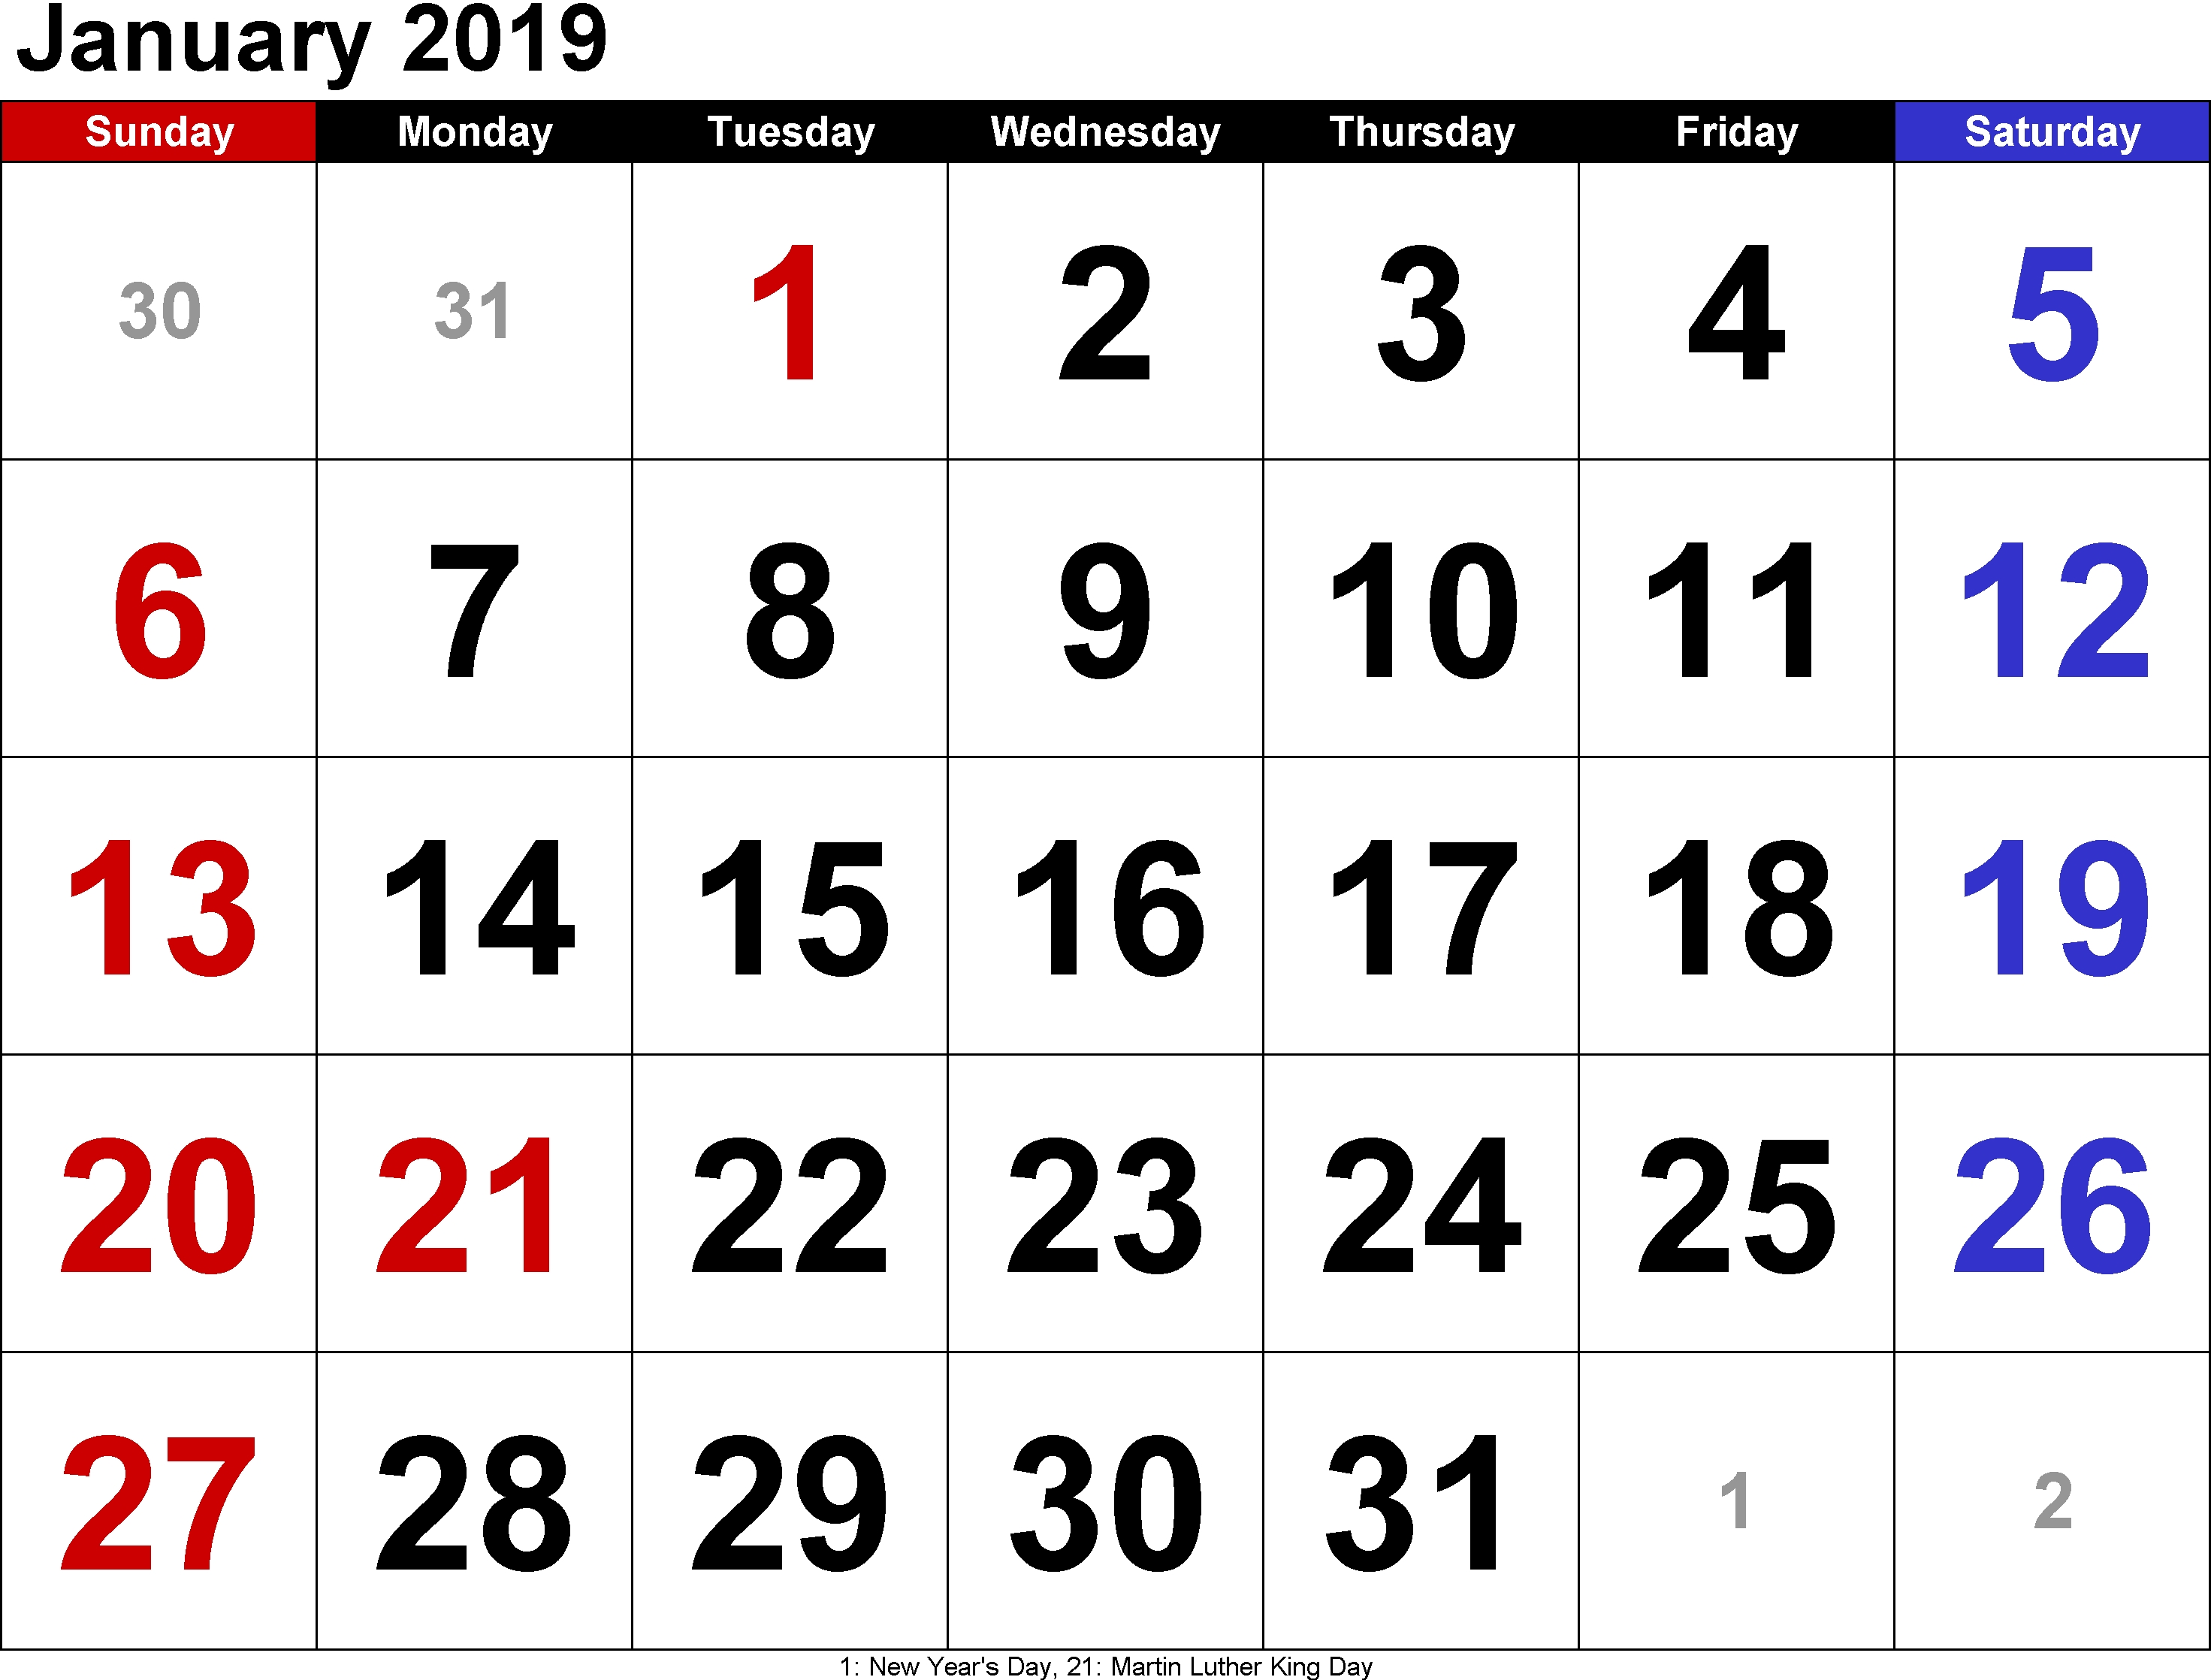 January 2019 Printable Calendar Templates - Free Printable Calendar January 8 2019 Calendar